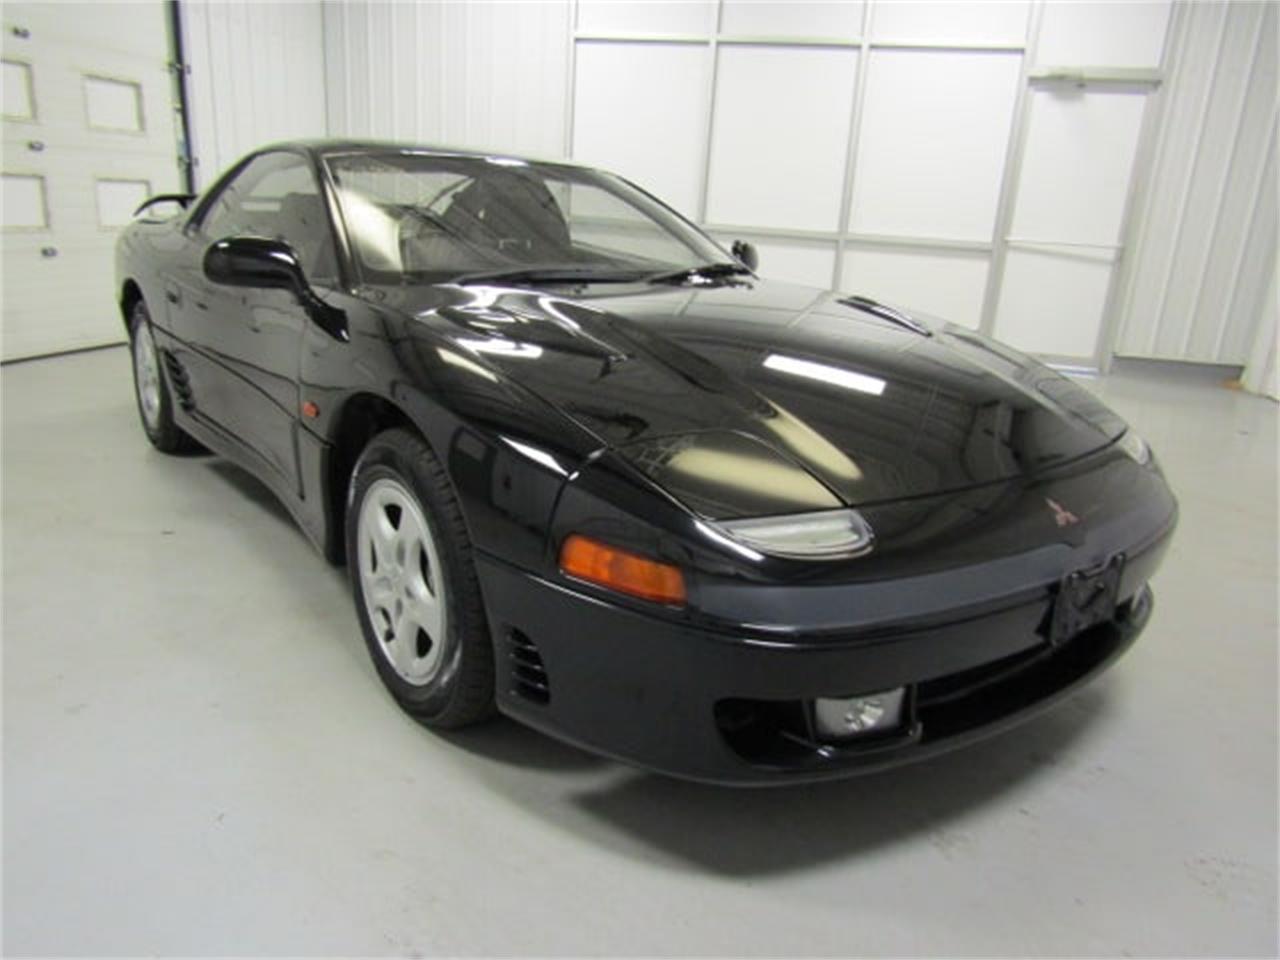 1992 Mitsubishi Montero Sr Test Drive Mitsubitshi Expo Lrv For Sale Gto In Christiansburg Virginia